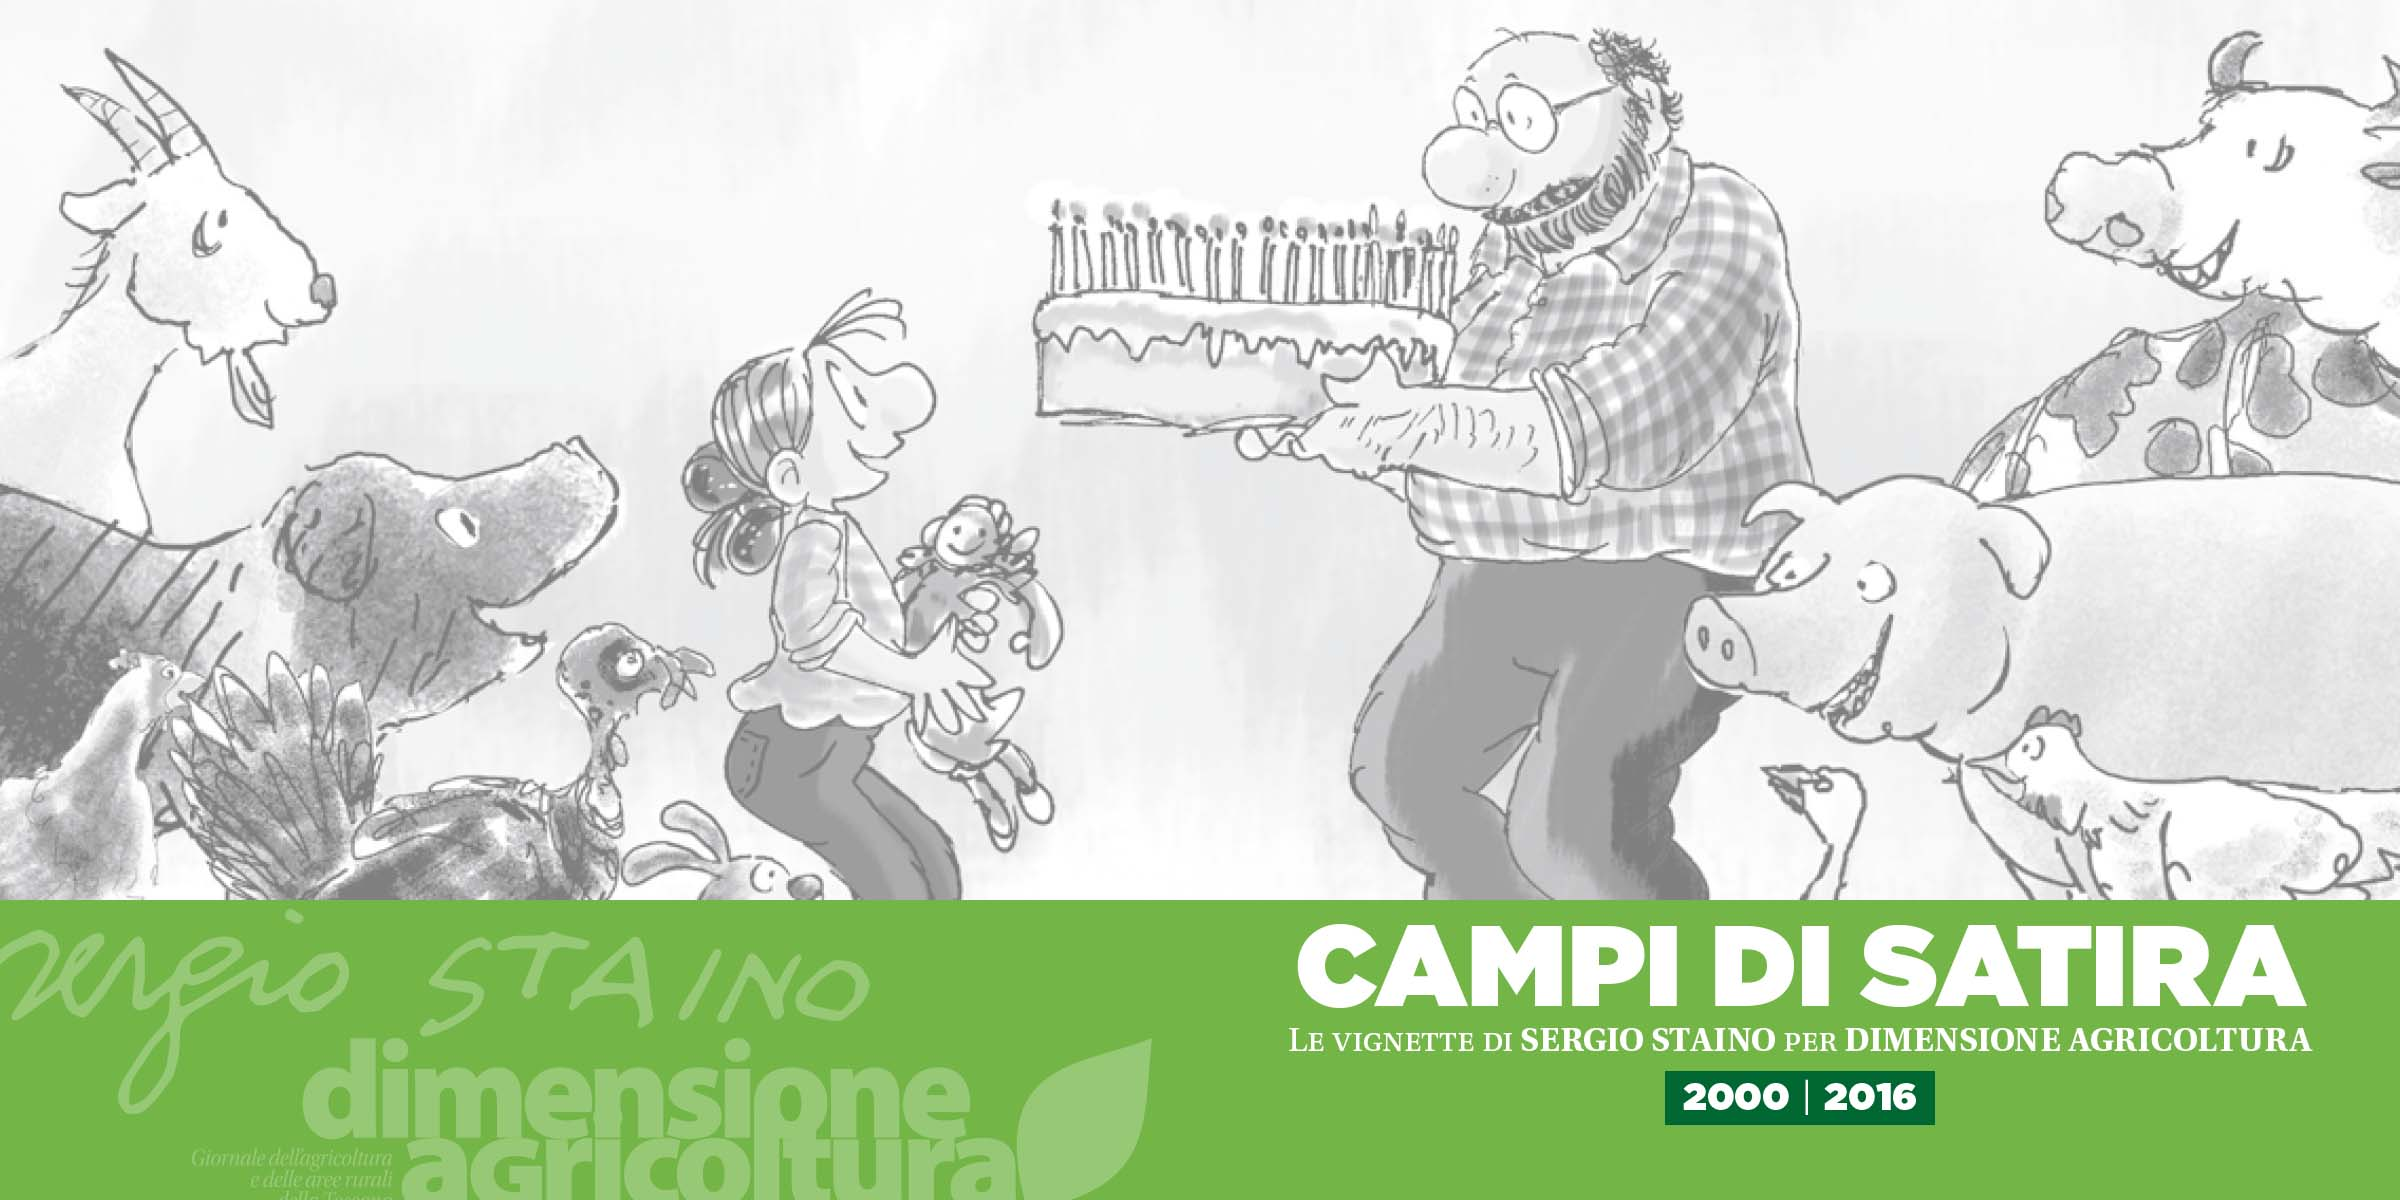 alfiotondelli_portfolio_campi-di-satira_02-03